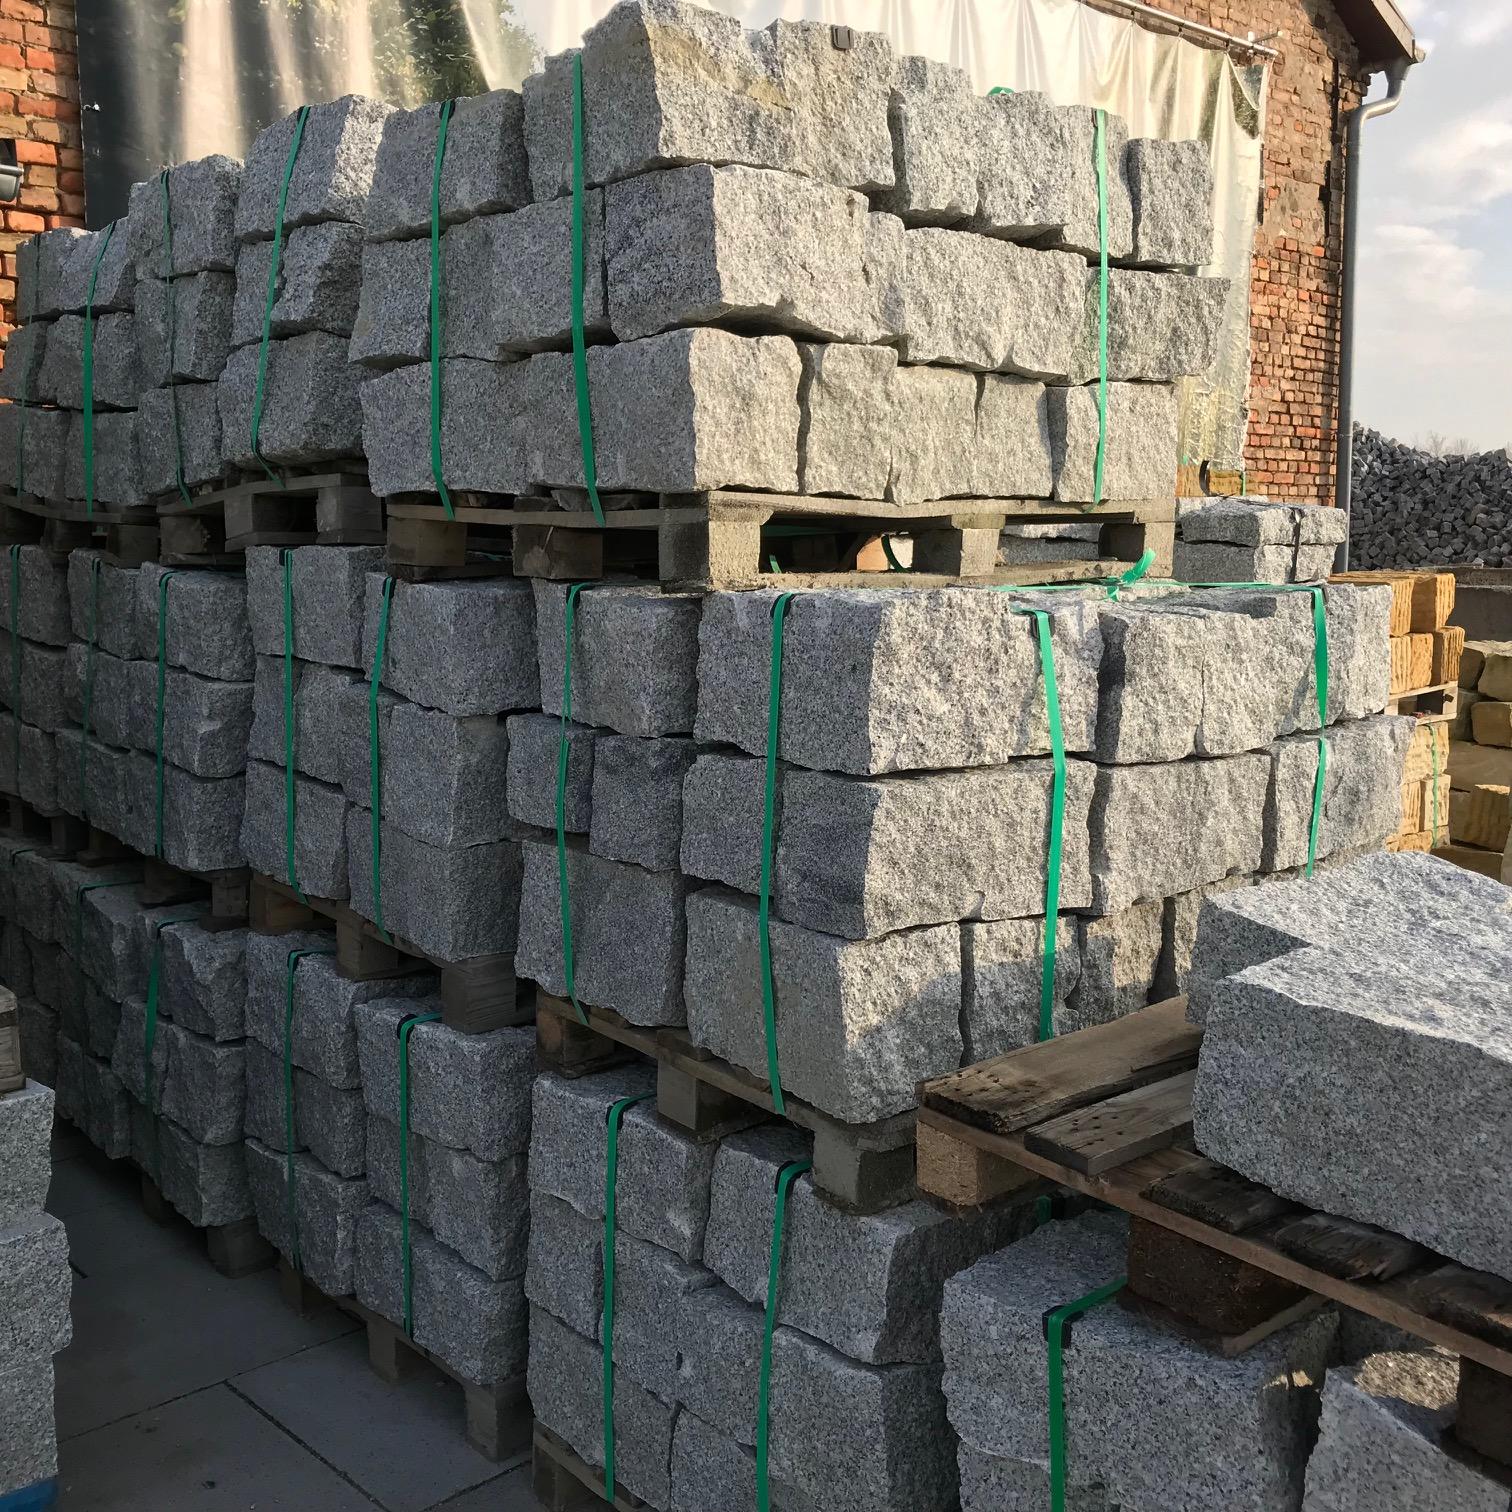 granit mauerstein 20x20x40 cm grau. Black Bedroom Furniture Sets. Home Design Ideas